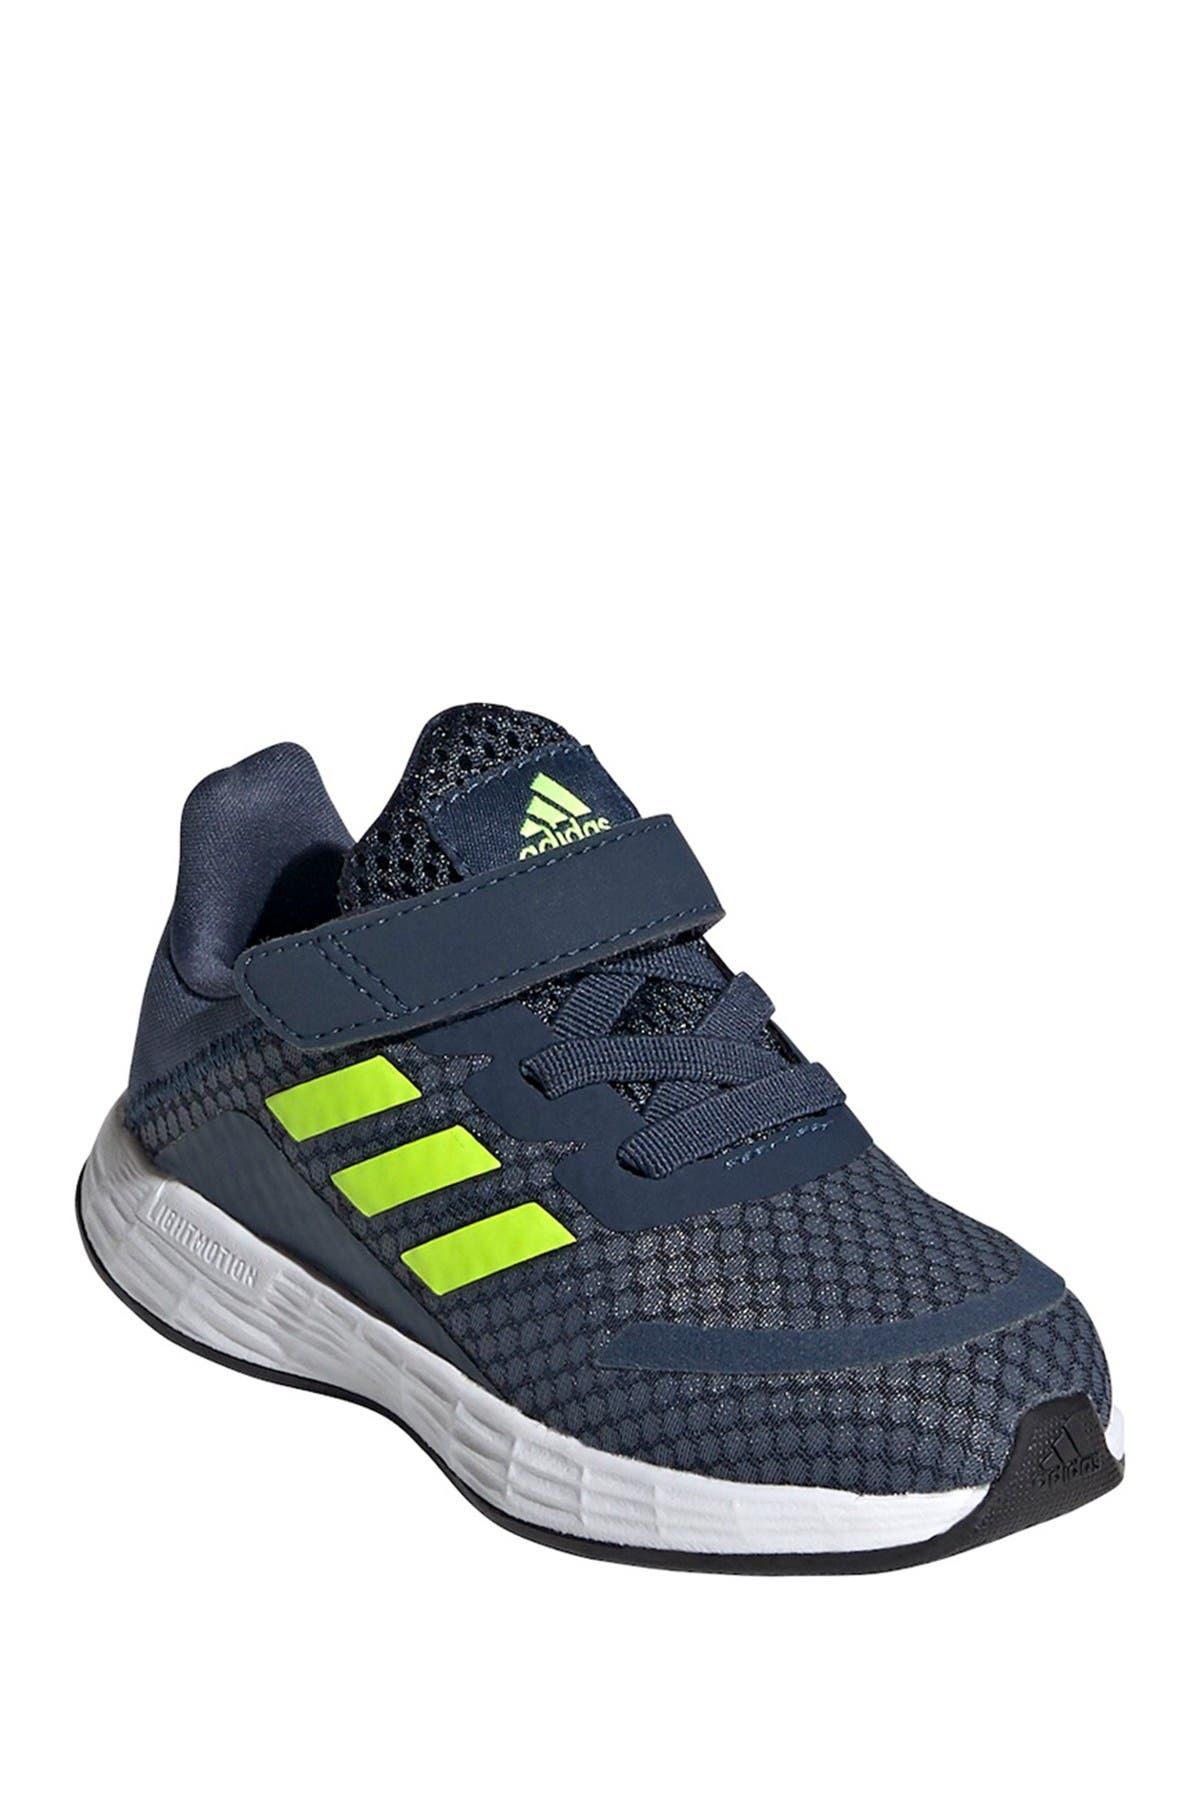 Image of adidas Duramo Sneaker